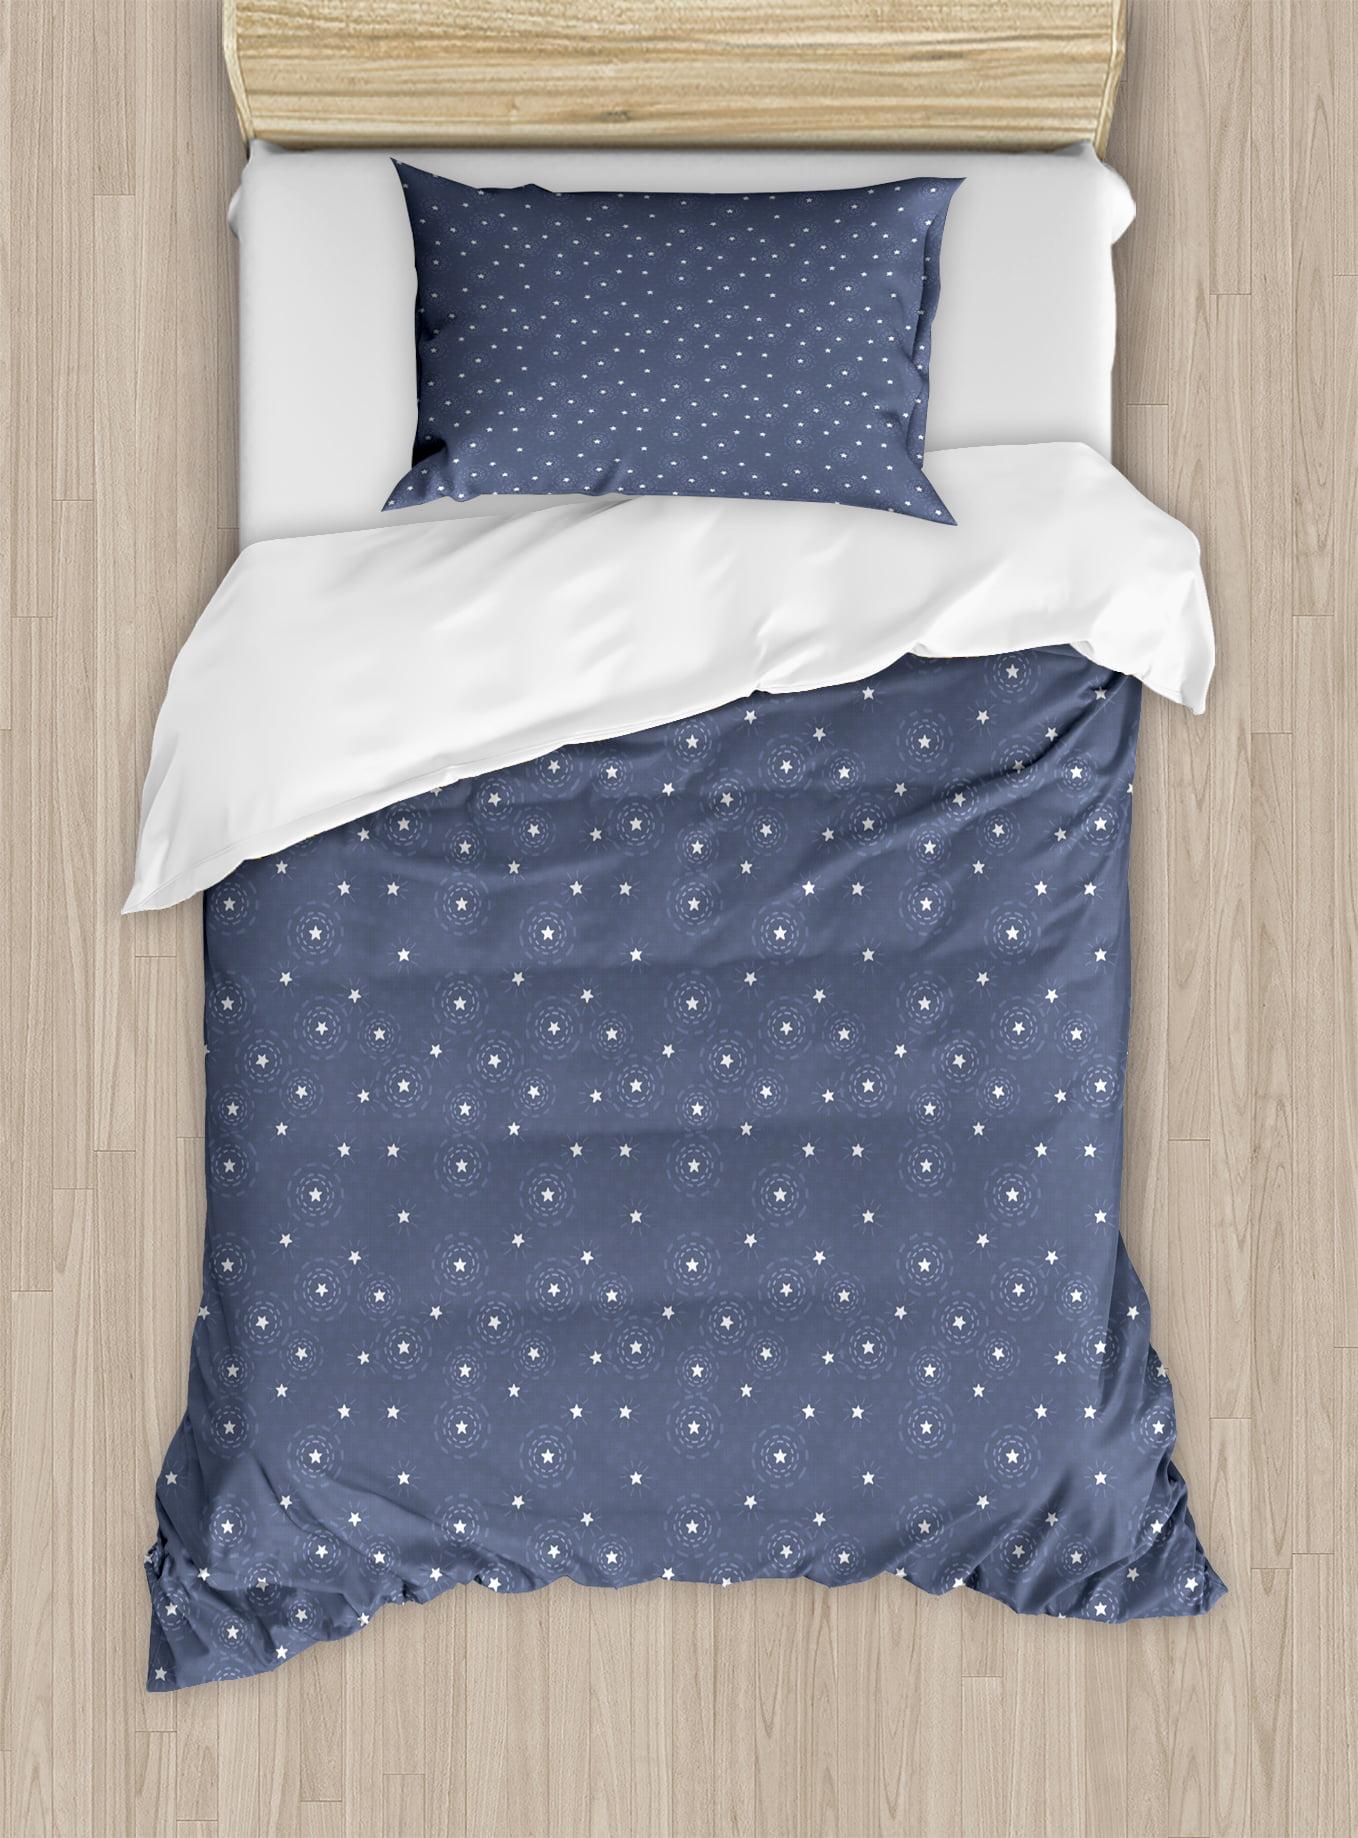 Navy Blue Duvet Cover Set Summer Night Sky With Messy Little White